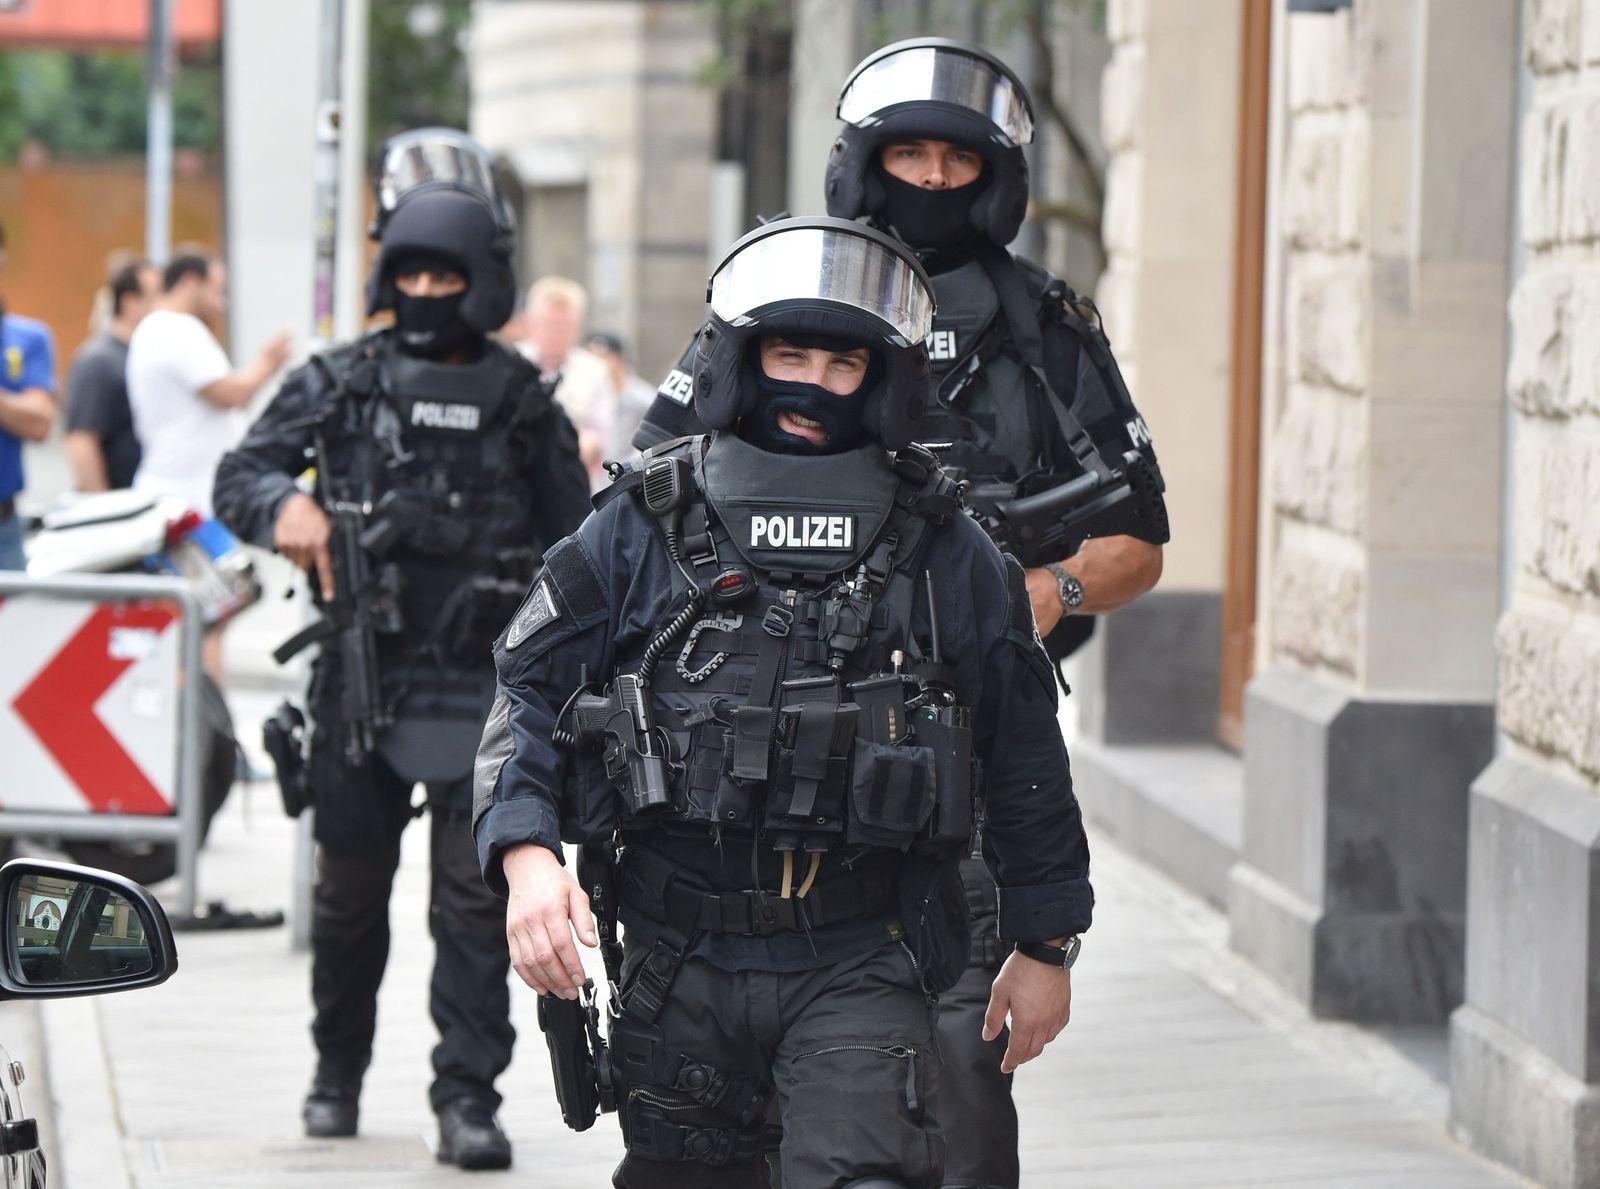 Spezialeinsatzkommandos / SEK / Polizei